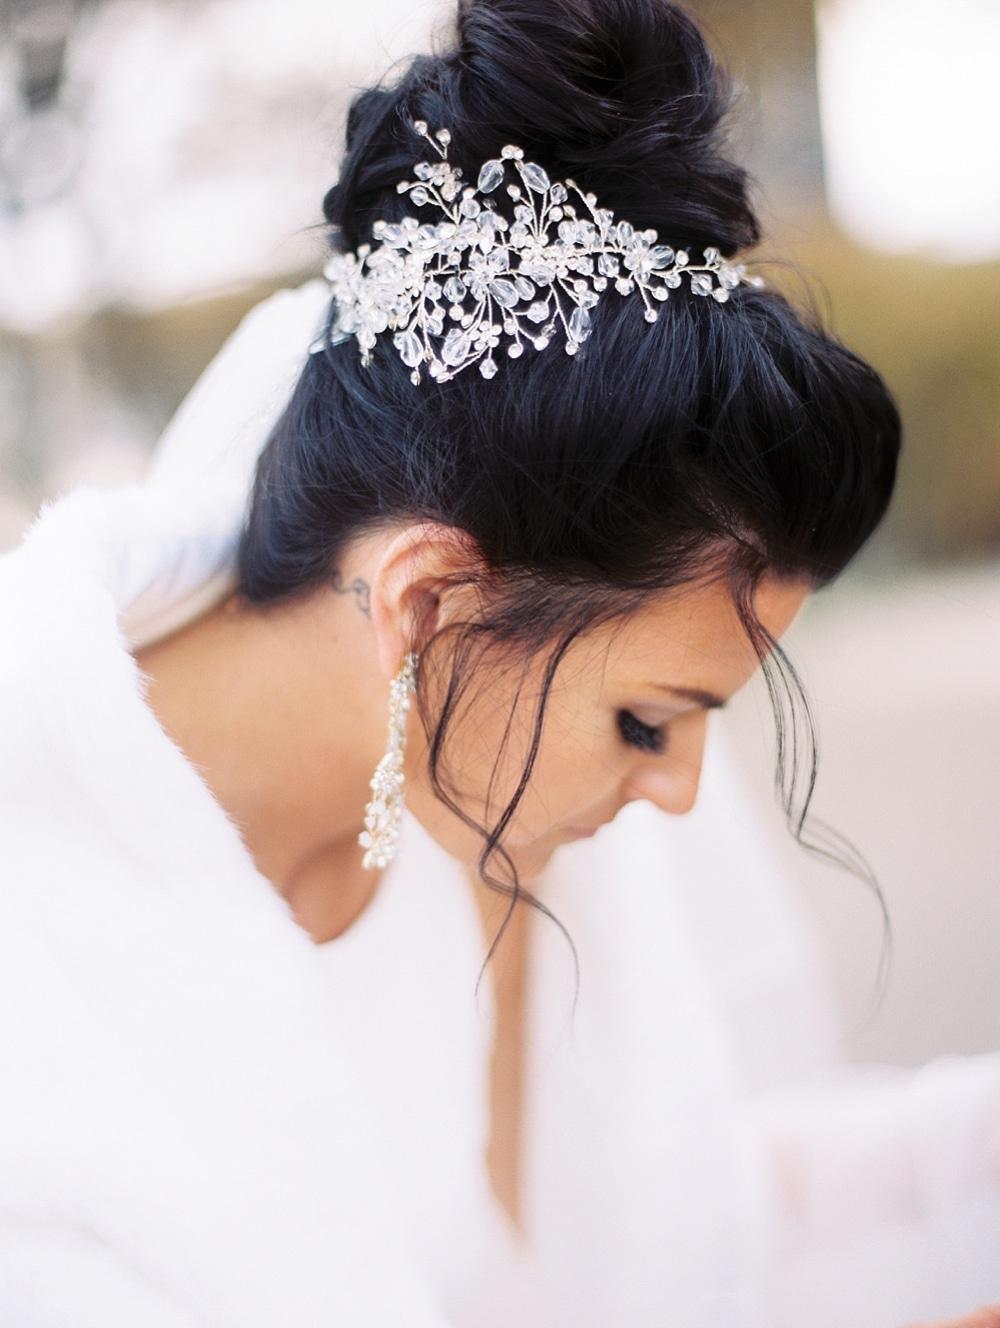 Kristin-La-Voie-Photography-chicago-wedding-photographer-120